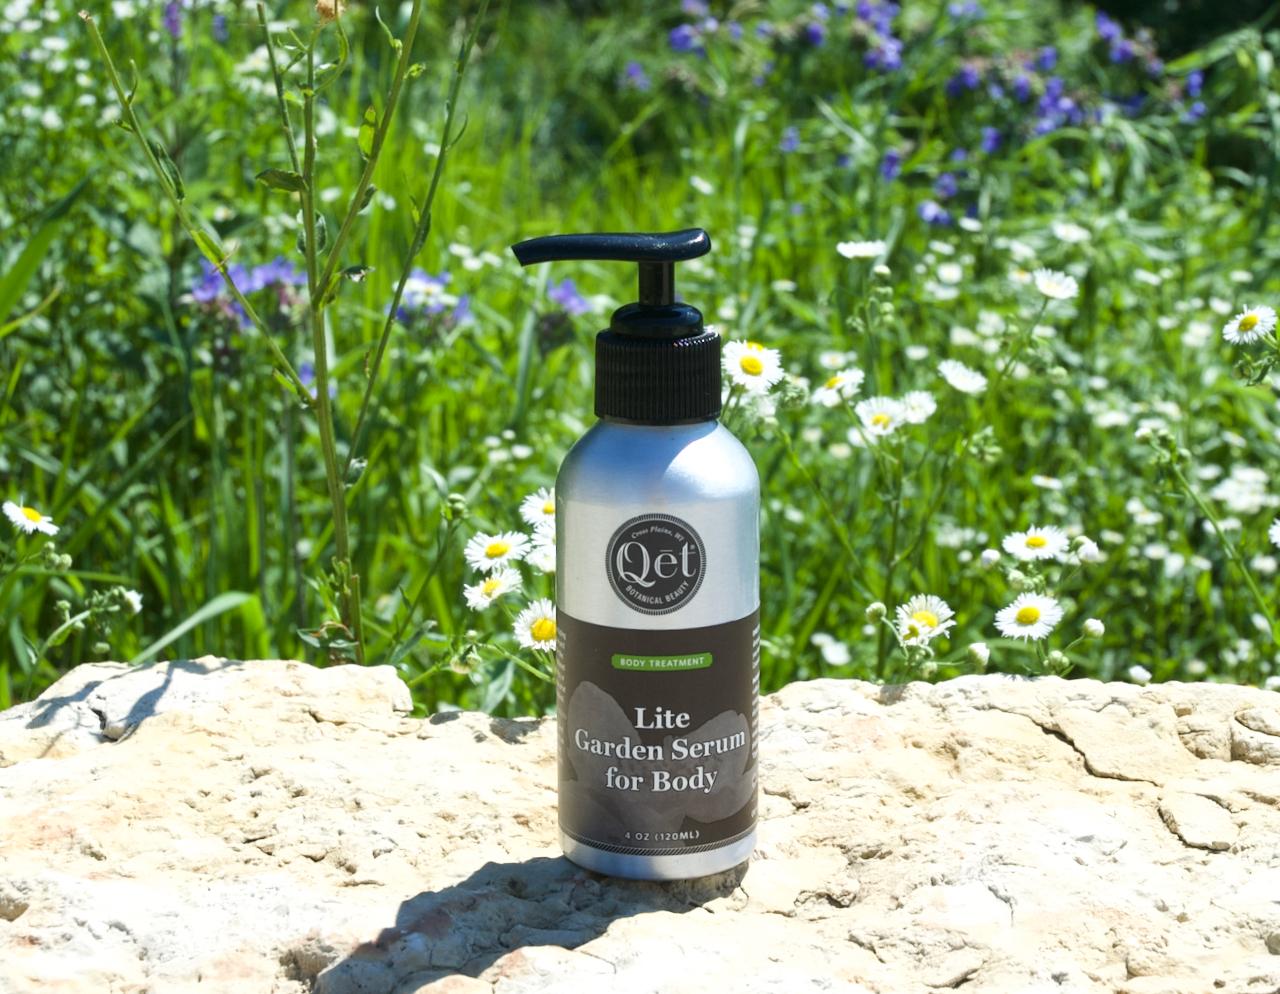 Qet-Botanicals-Lite-Garden-Serum-for-Sensitive-Skin-and-Eczema